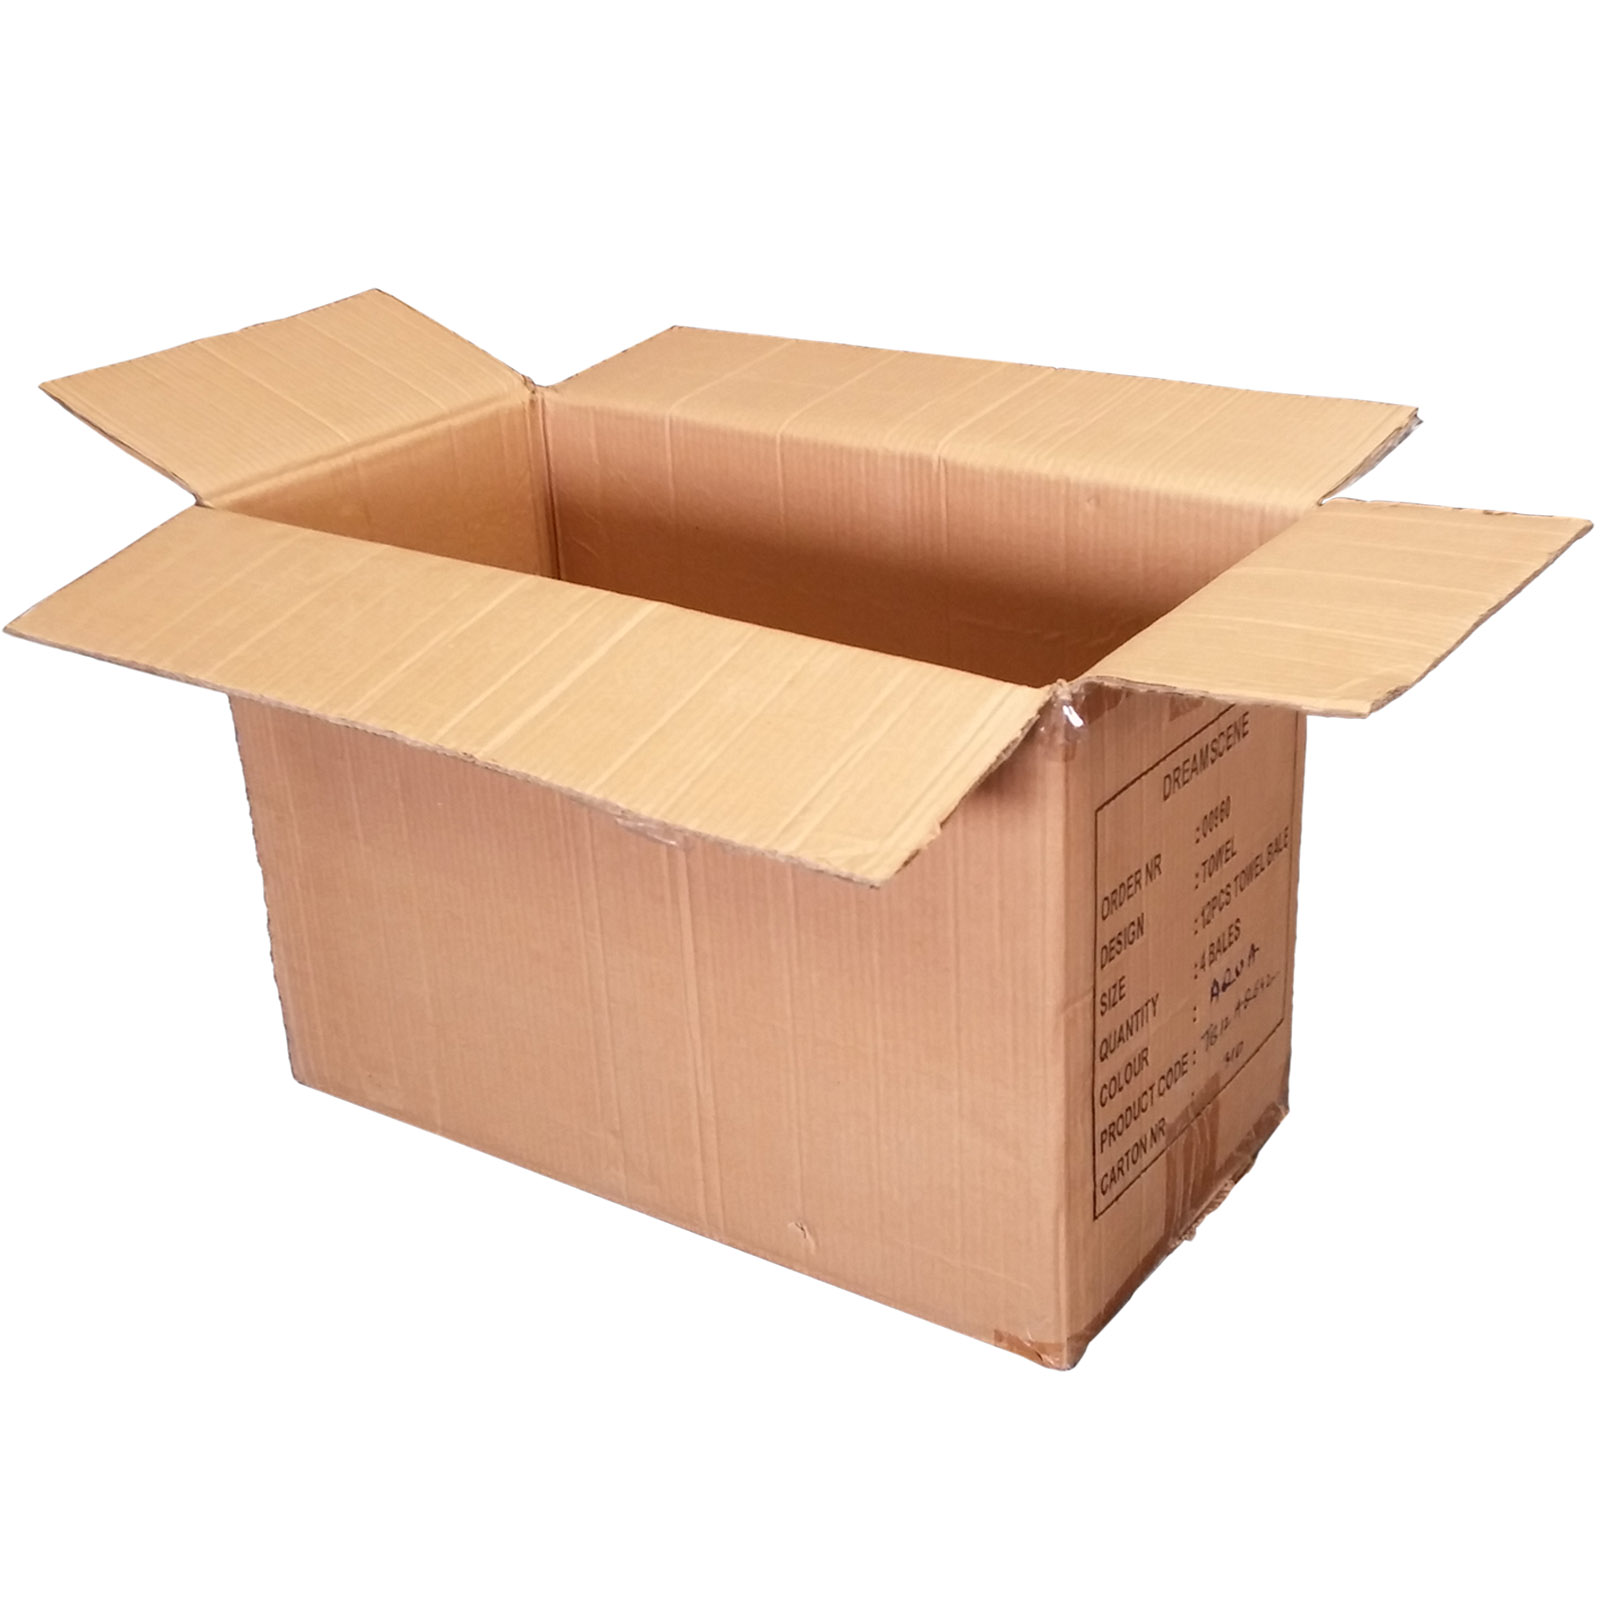 Cardboard storage box 20